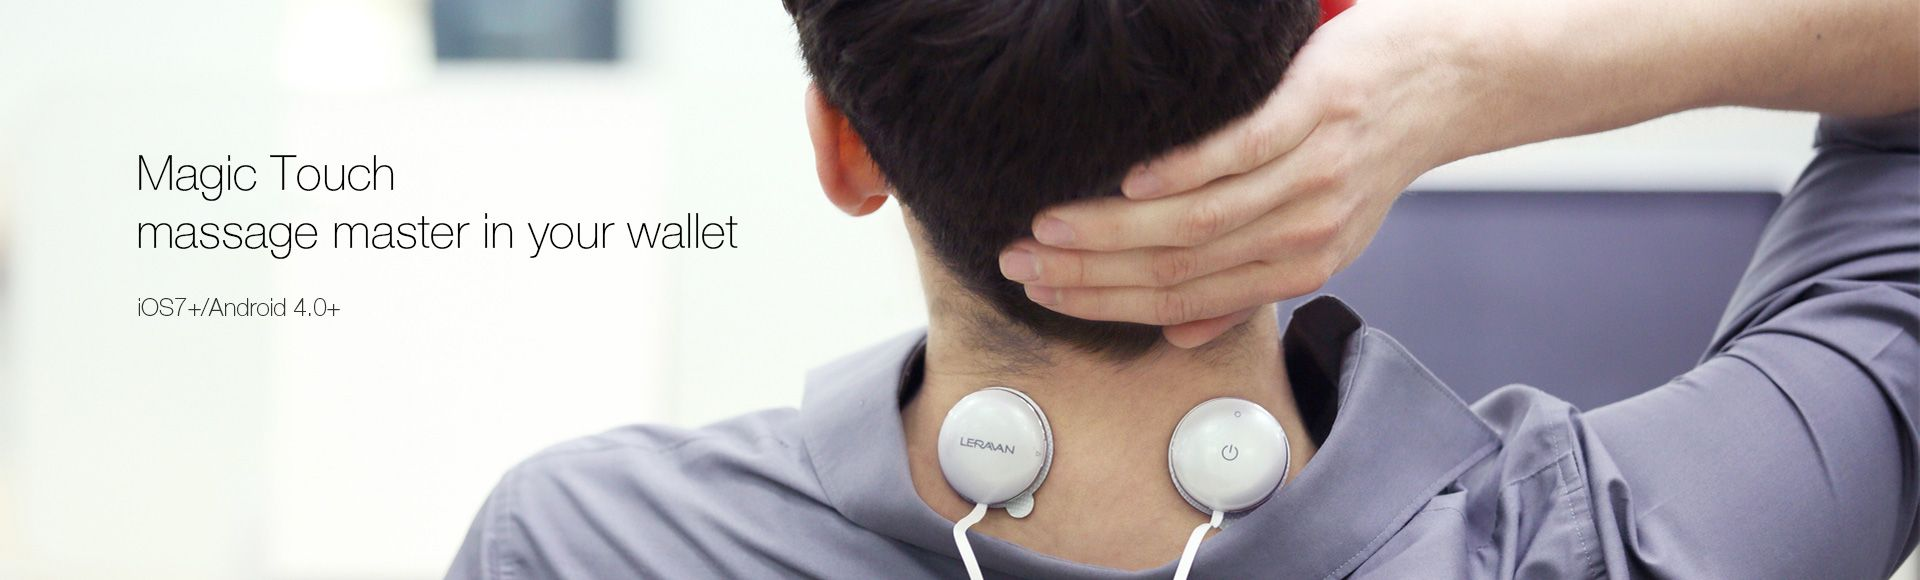 Leravan Mobile Intelligent Massage Master - Magic touch massage master in your wallet